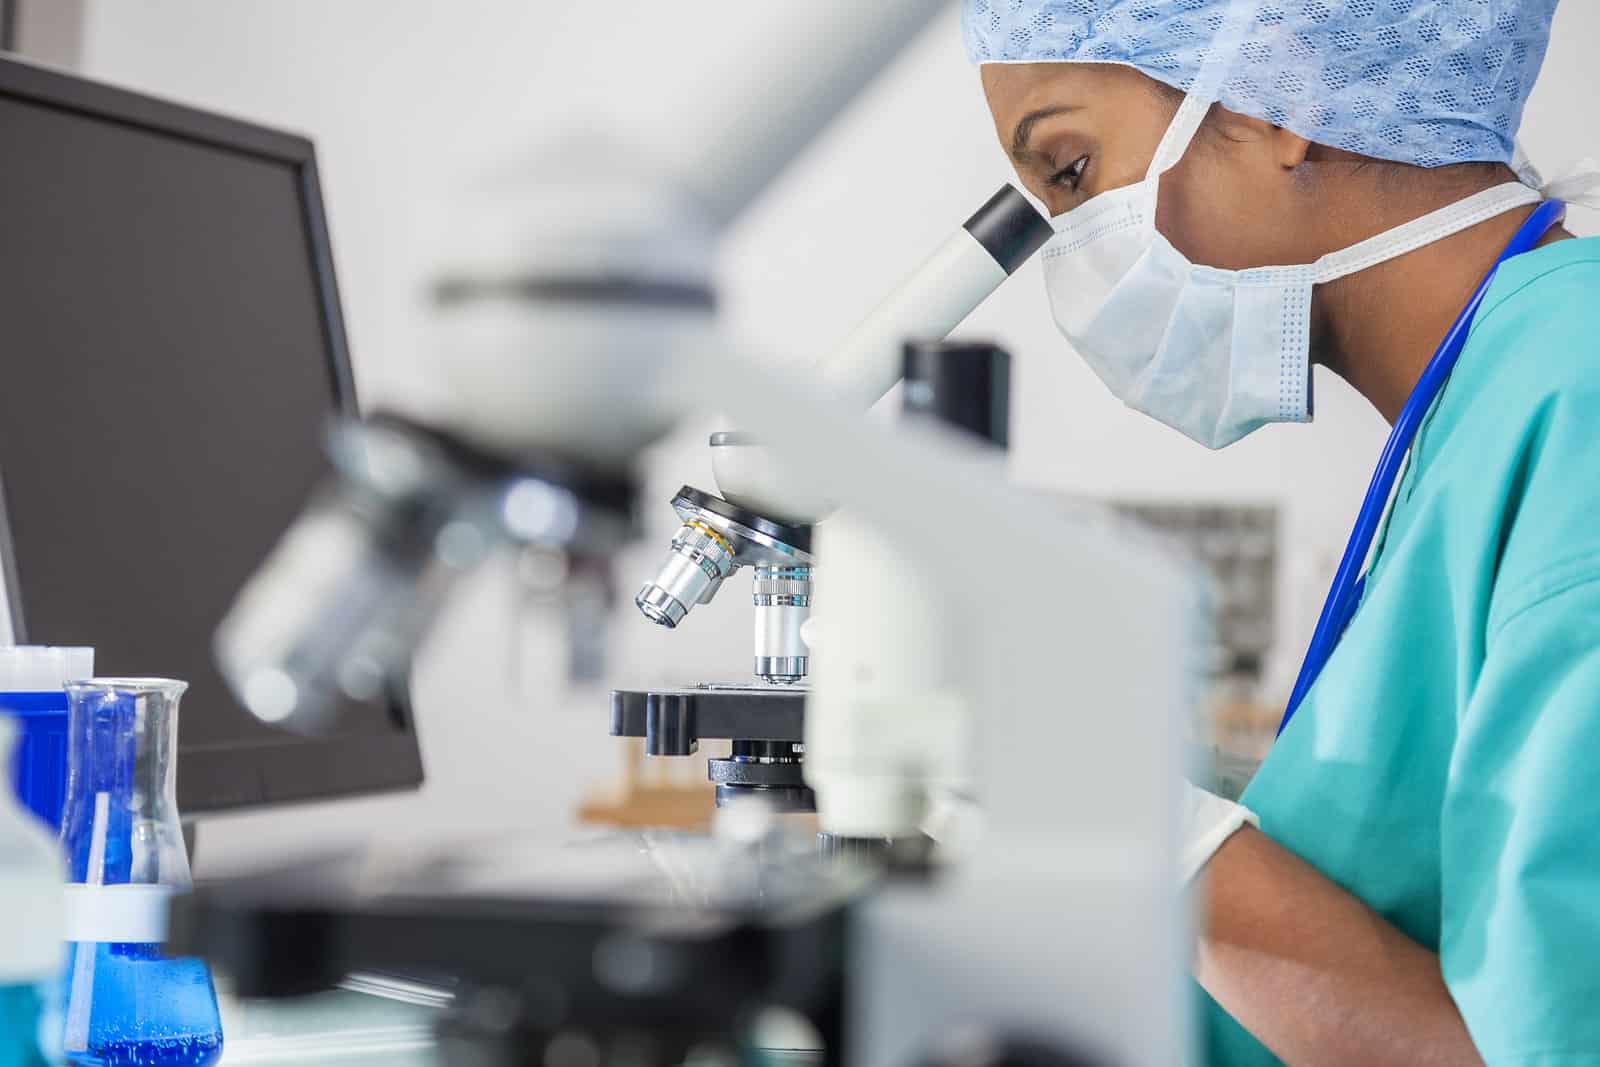 A Female Doctor Looks Through a Microscope